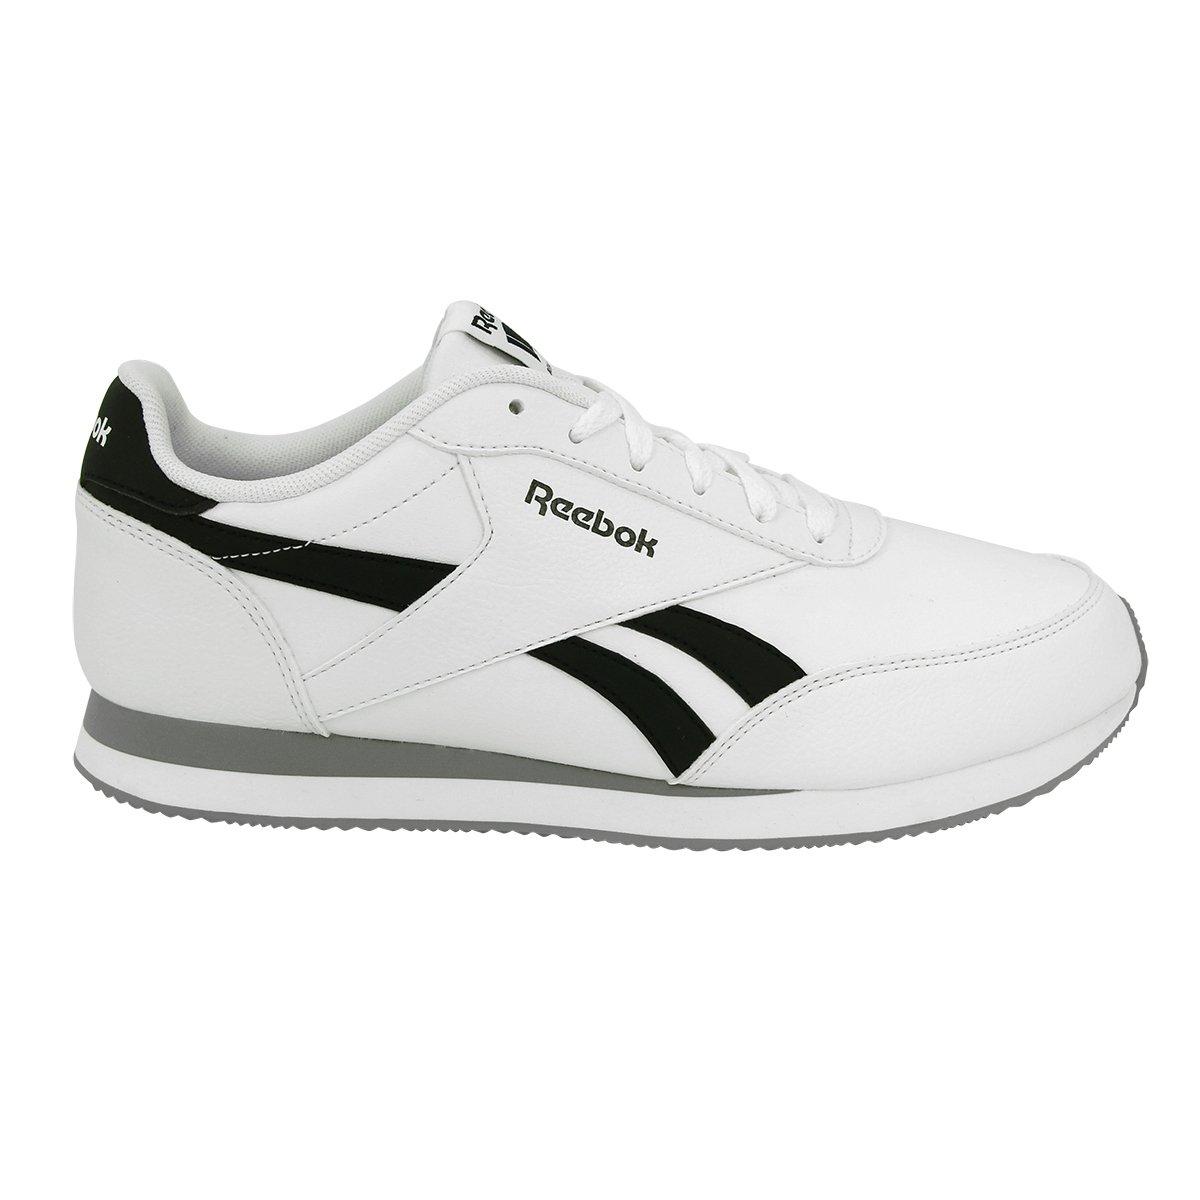 de103560c76b1c Reebok Unisex-Erwachsene Royal Classic Jogger 2l Sneakers 42